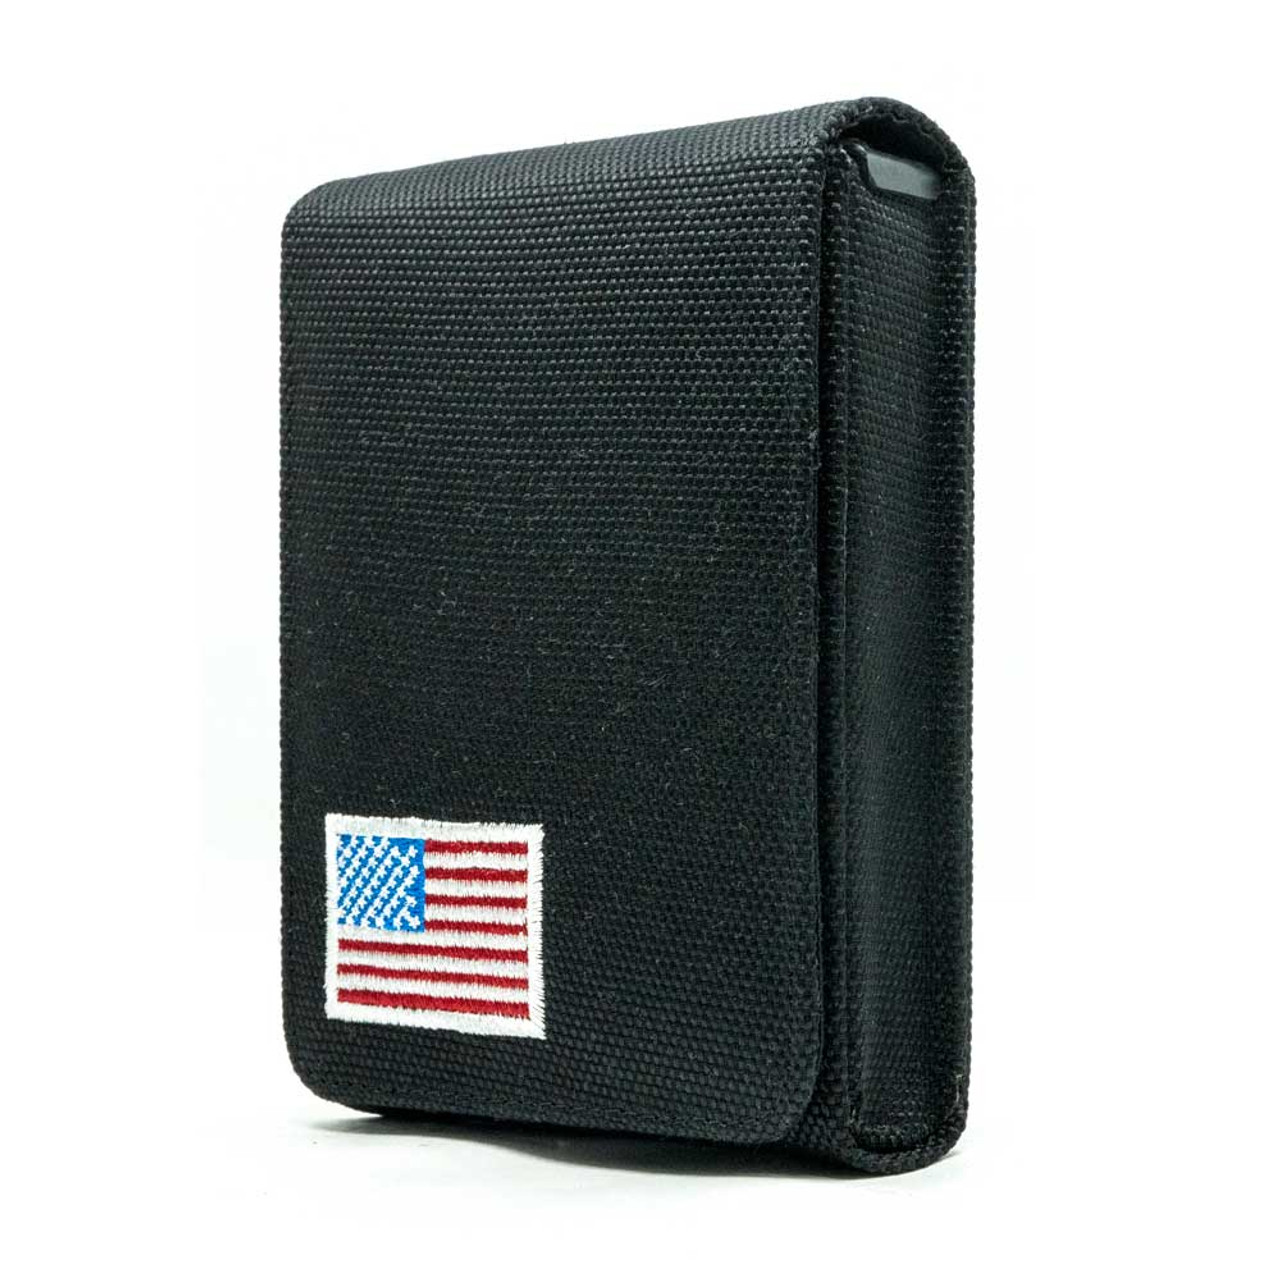 Glock 19X Black Canvas Flag Series Holster